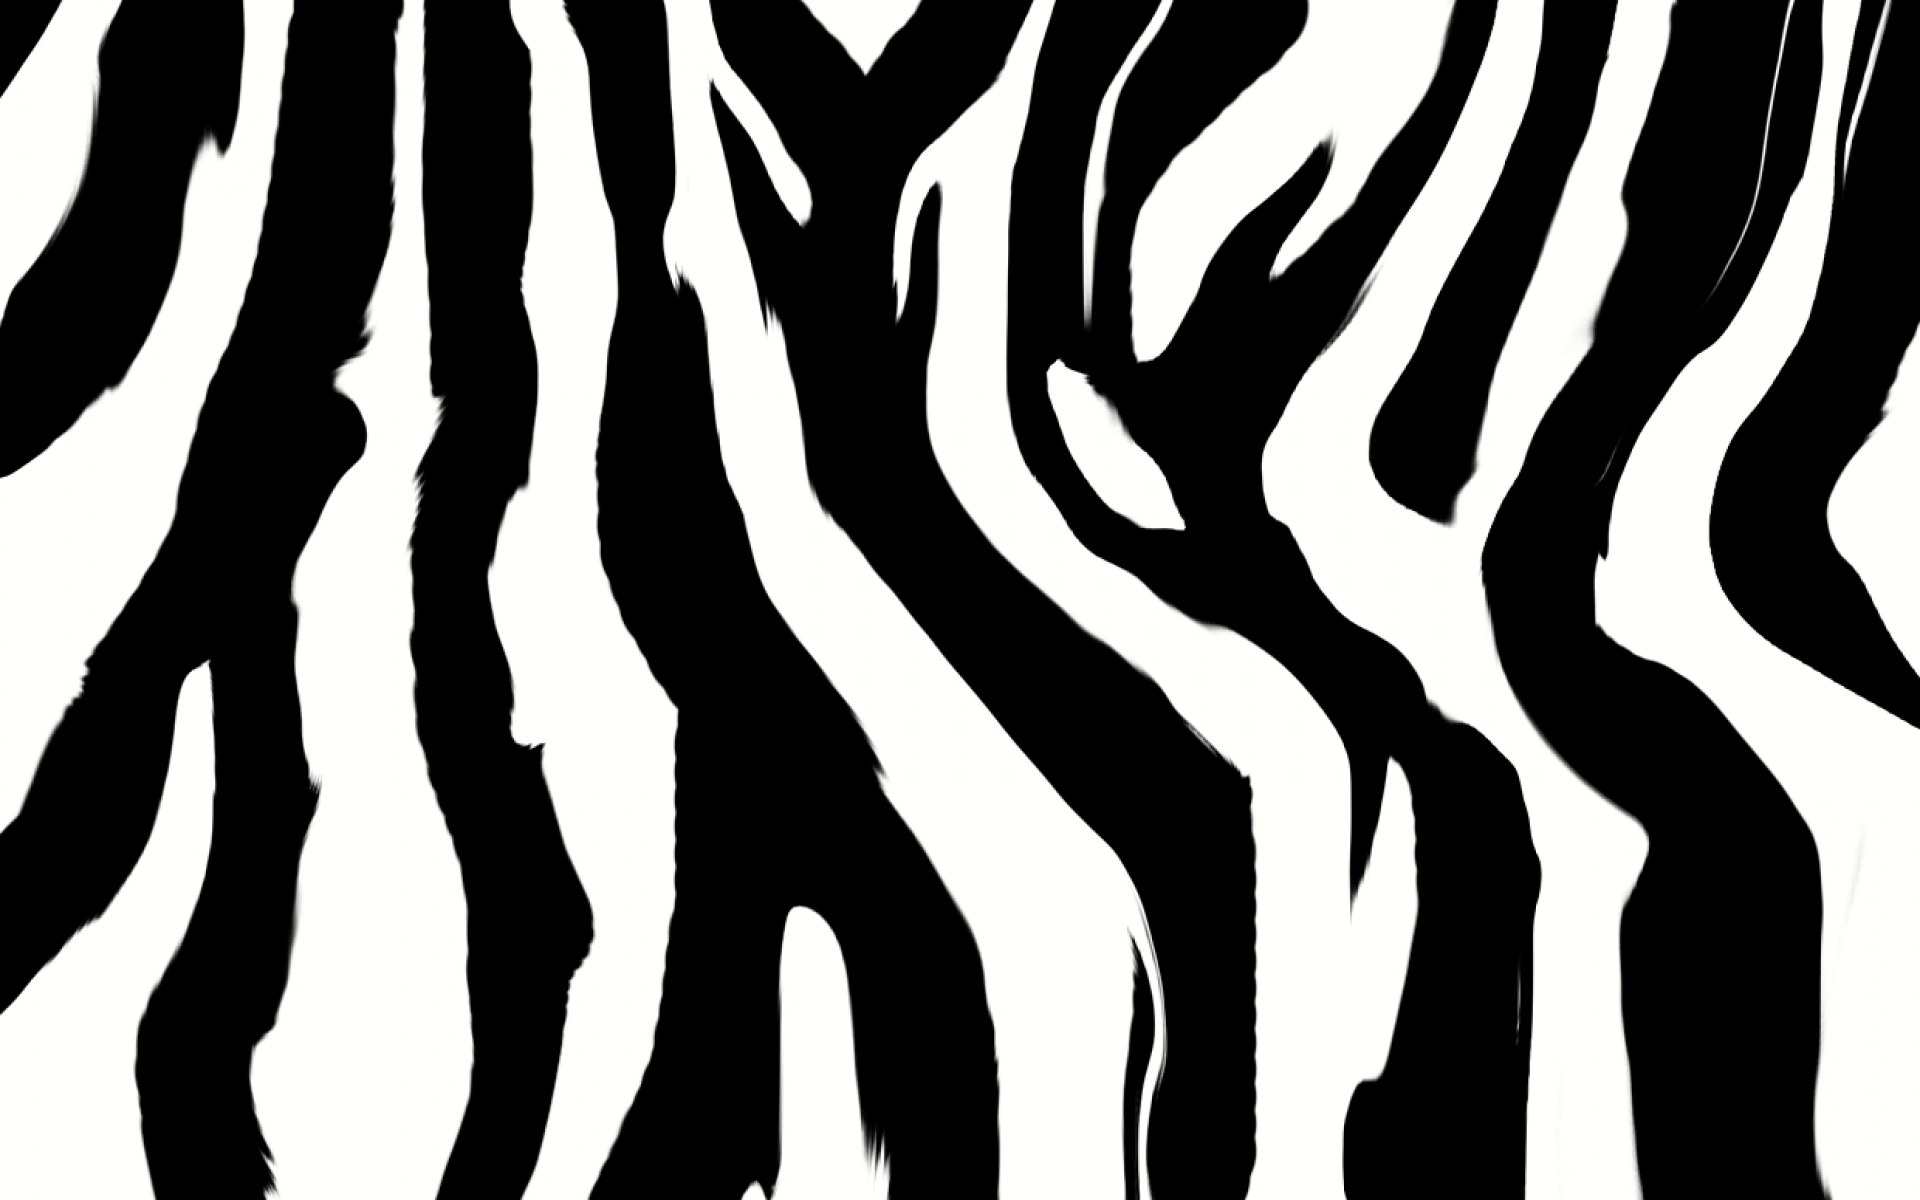 zebra backgrounds hd wallpaper hd wallpapers pinterest zebra